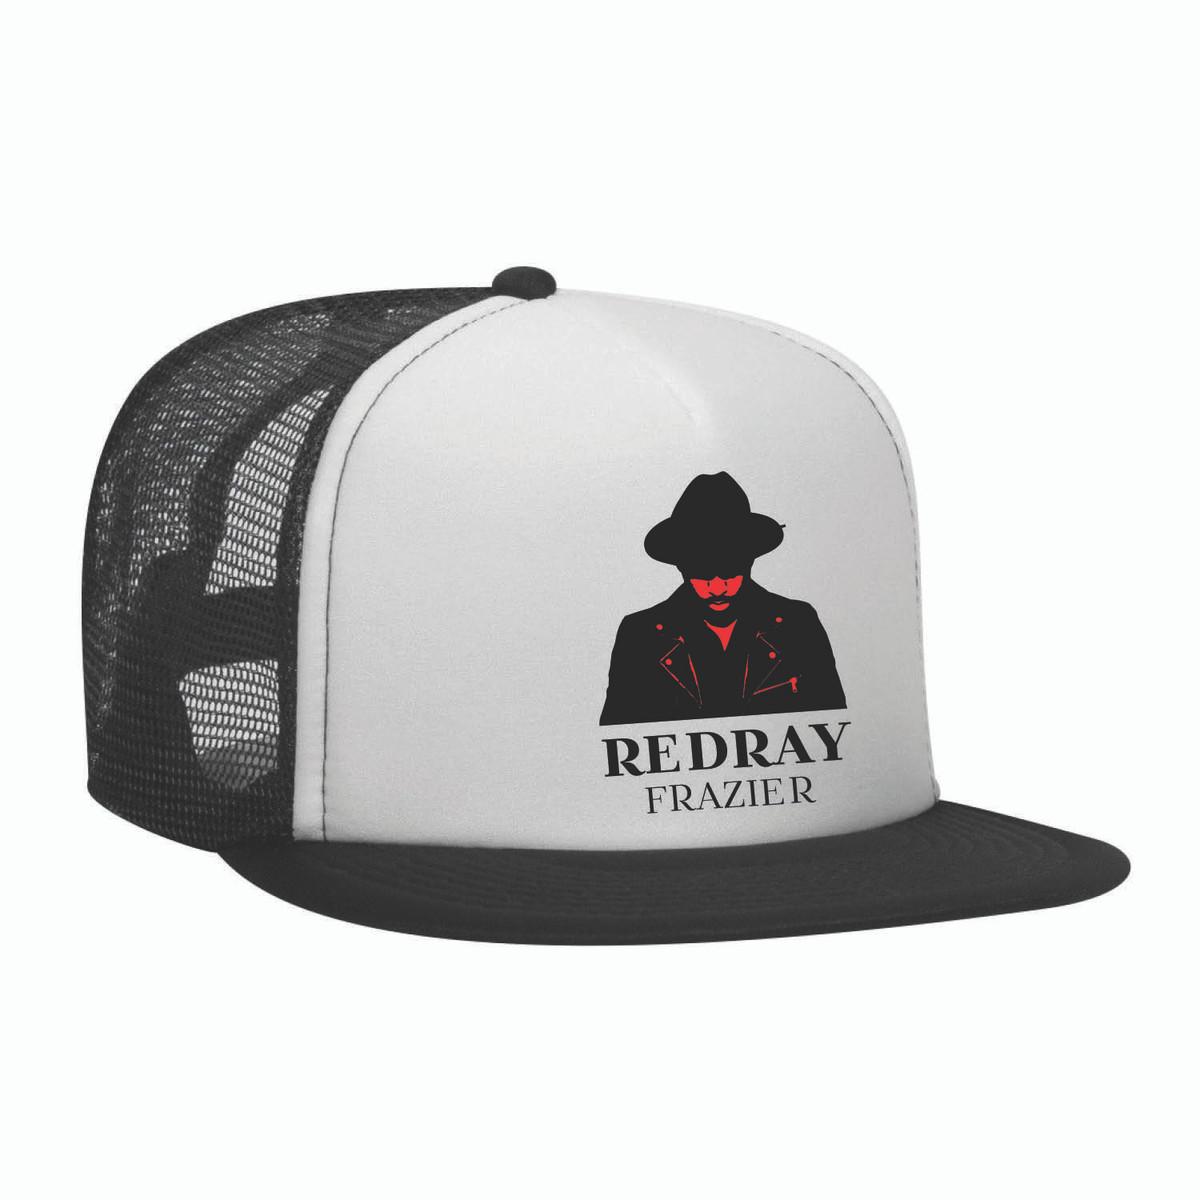 RedRay Frazier Trucker Cap